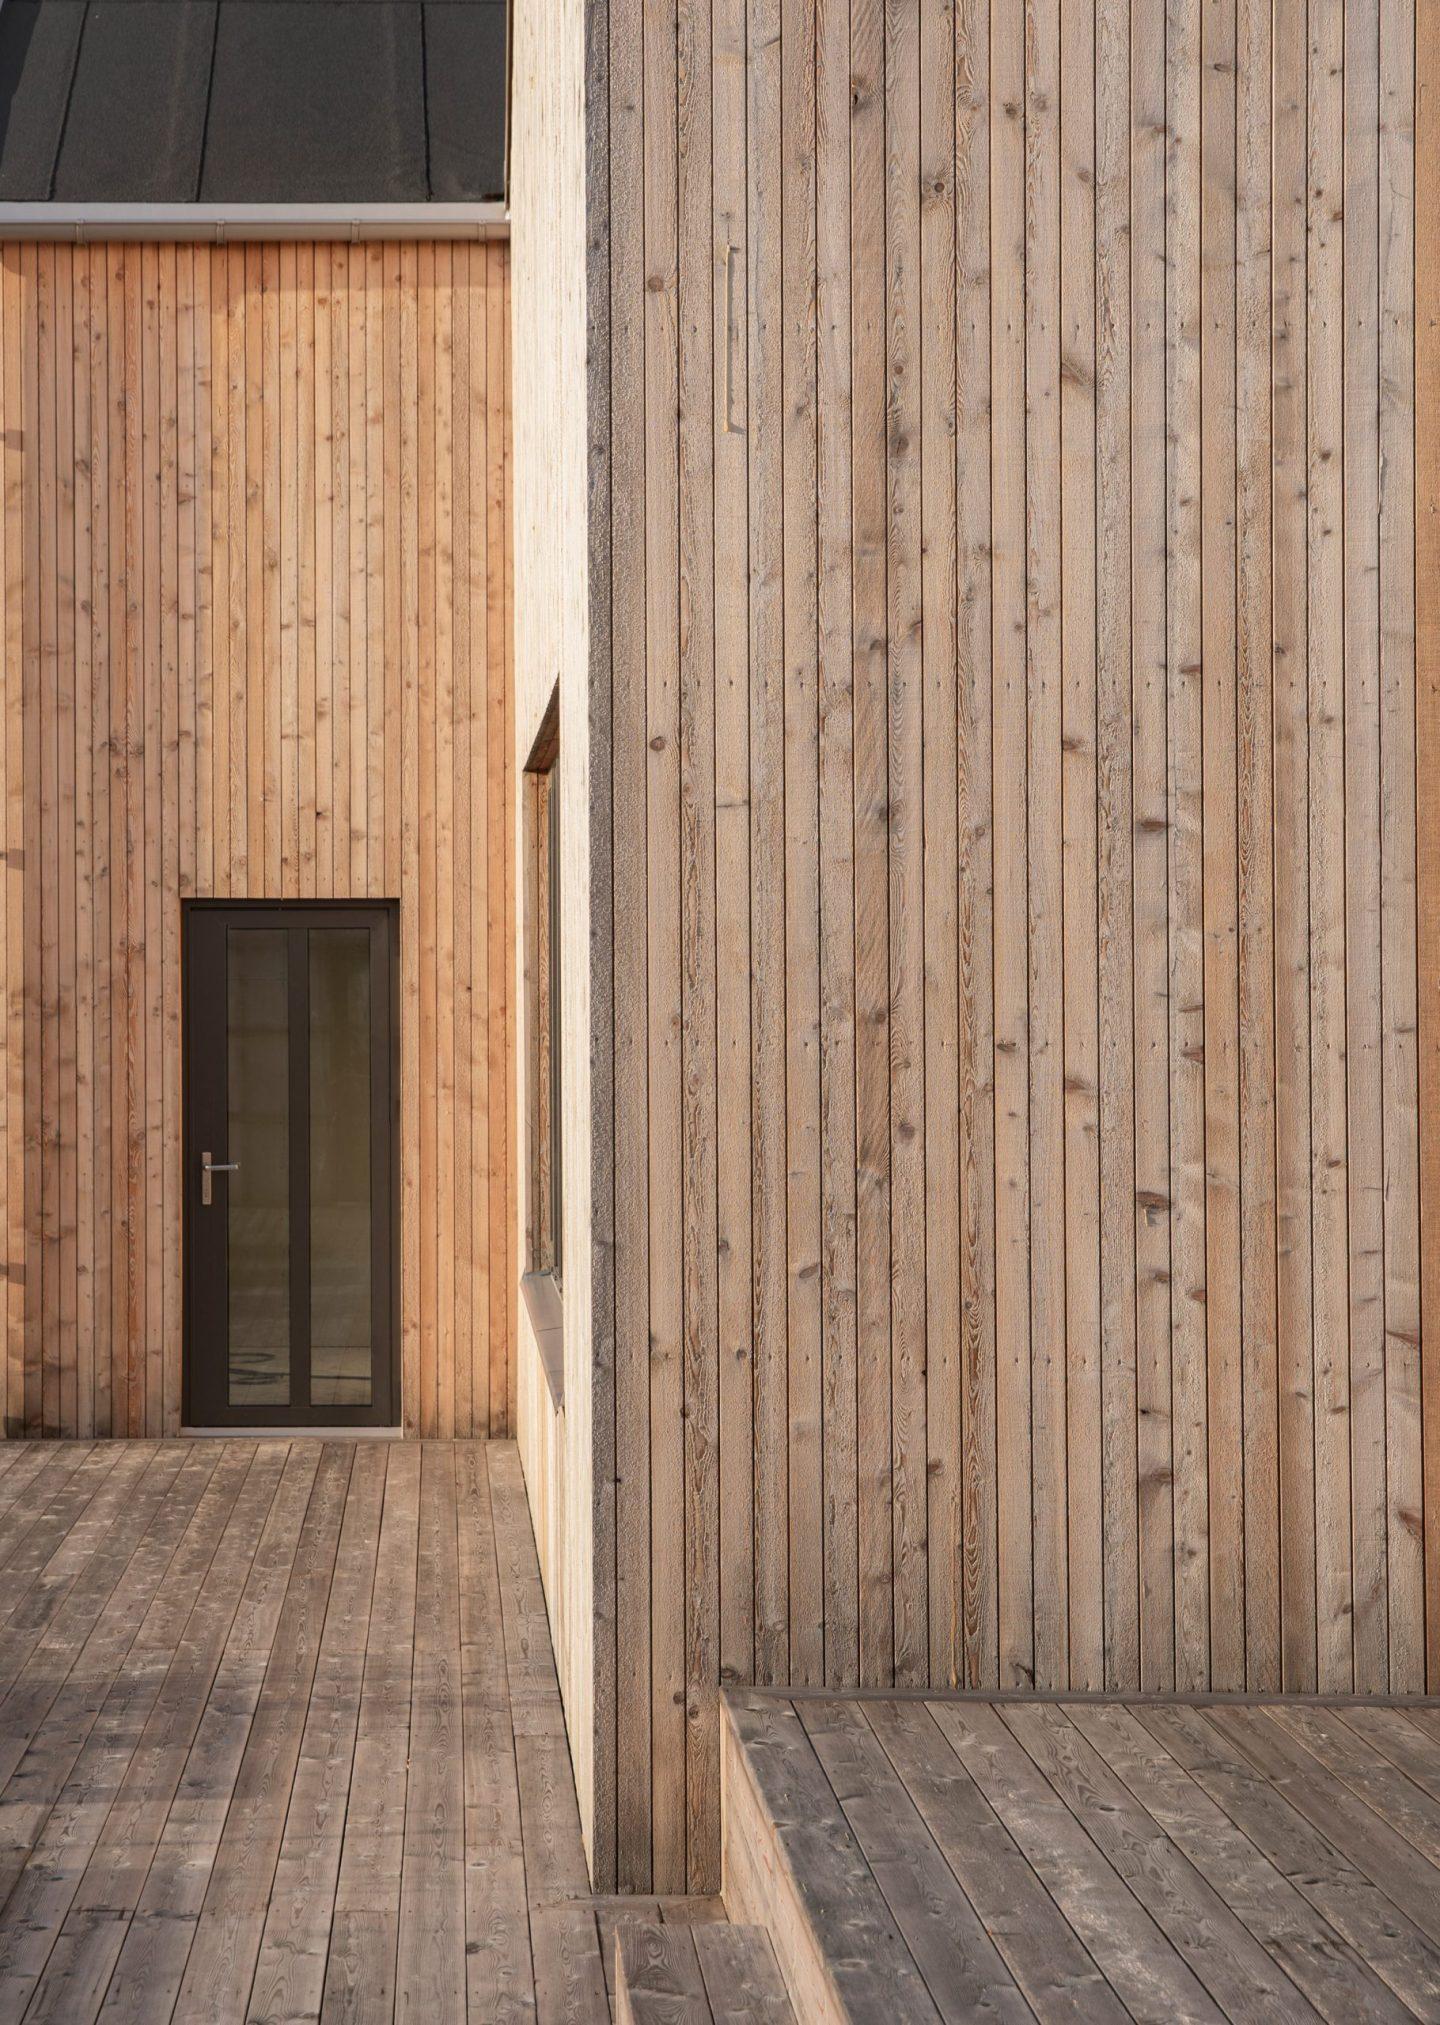 IGNANT-Architecture-Norm-Architects-Archipelago-House-02